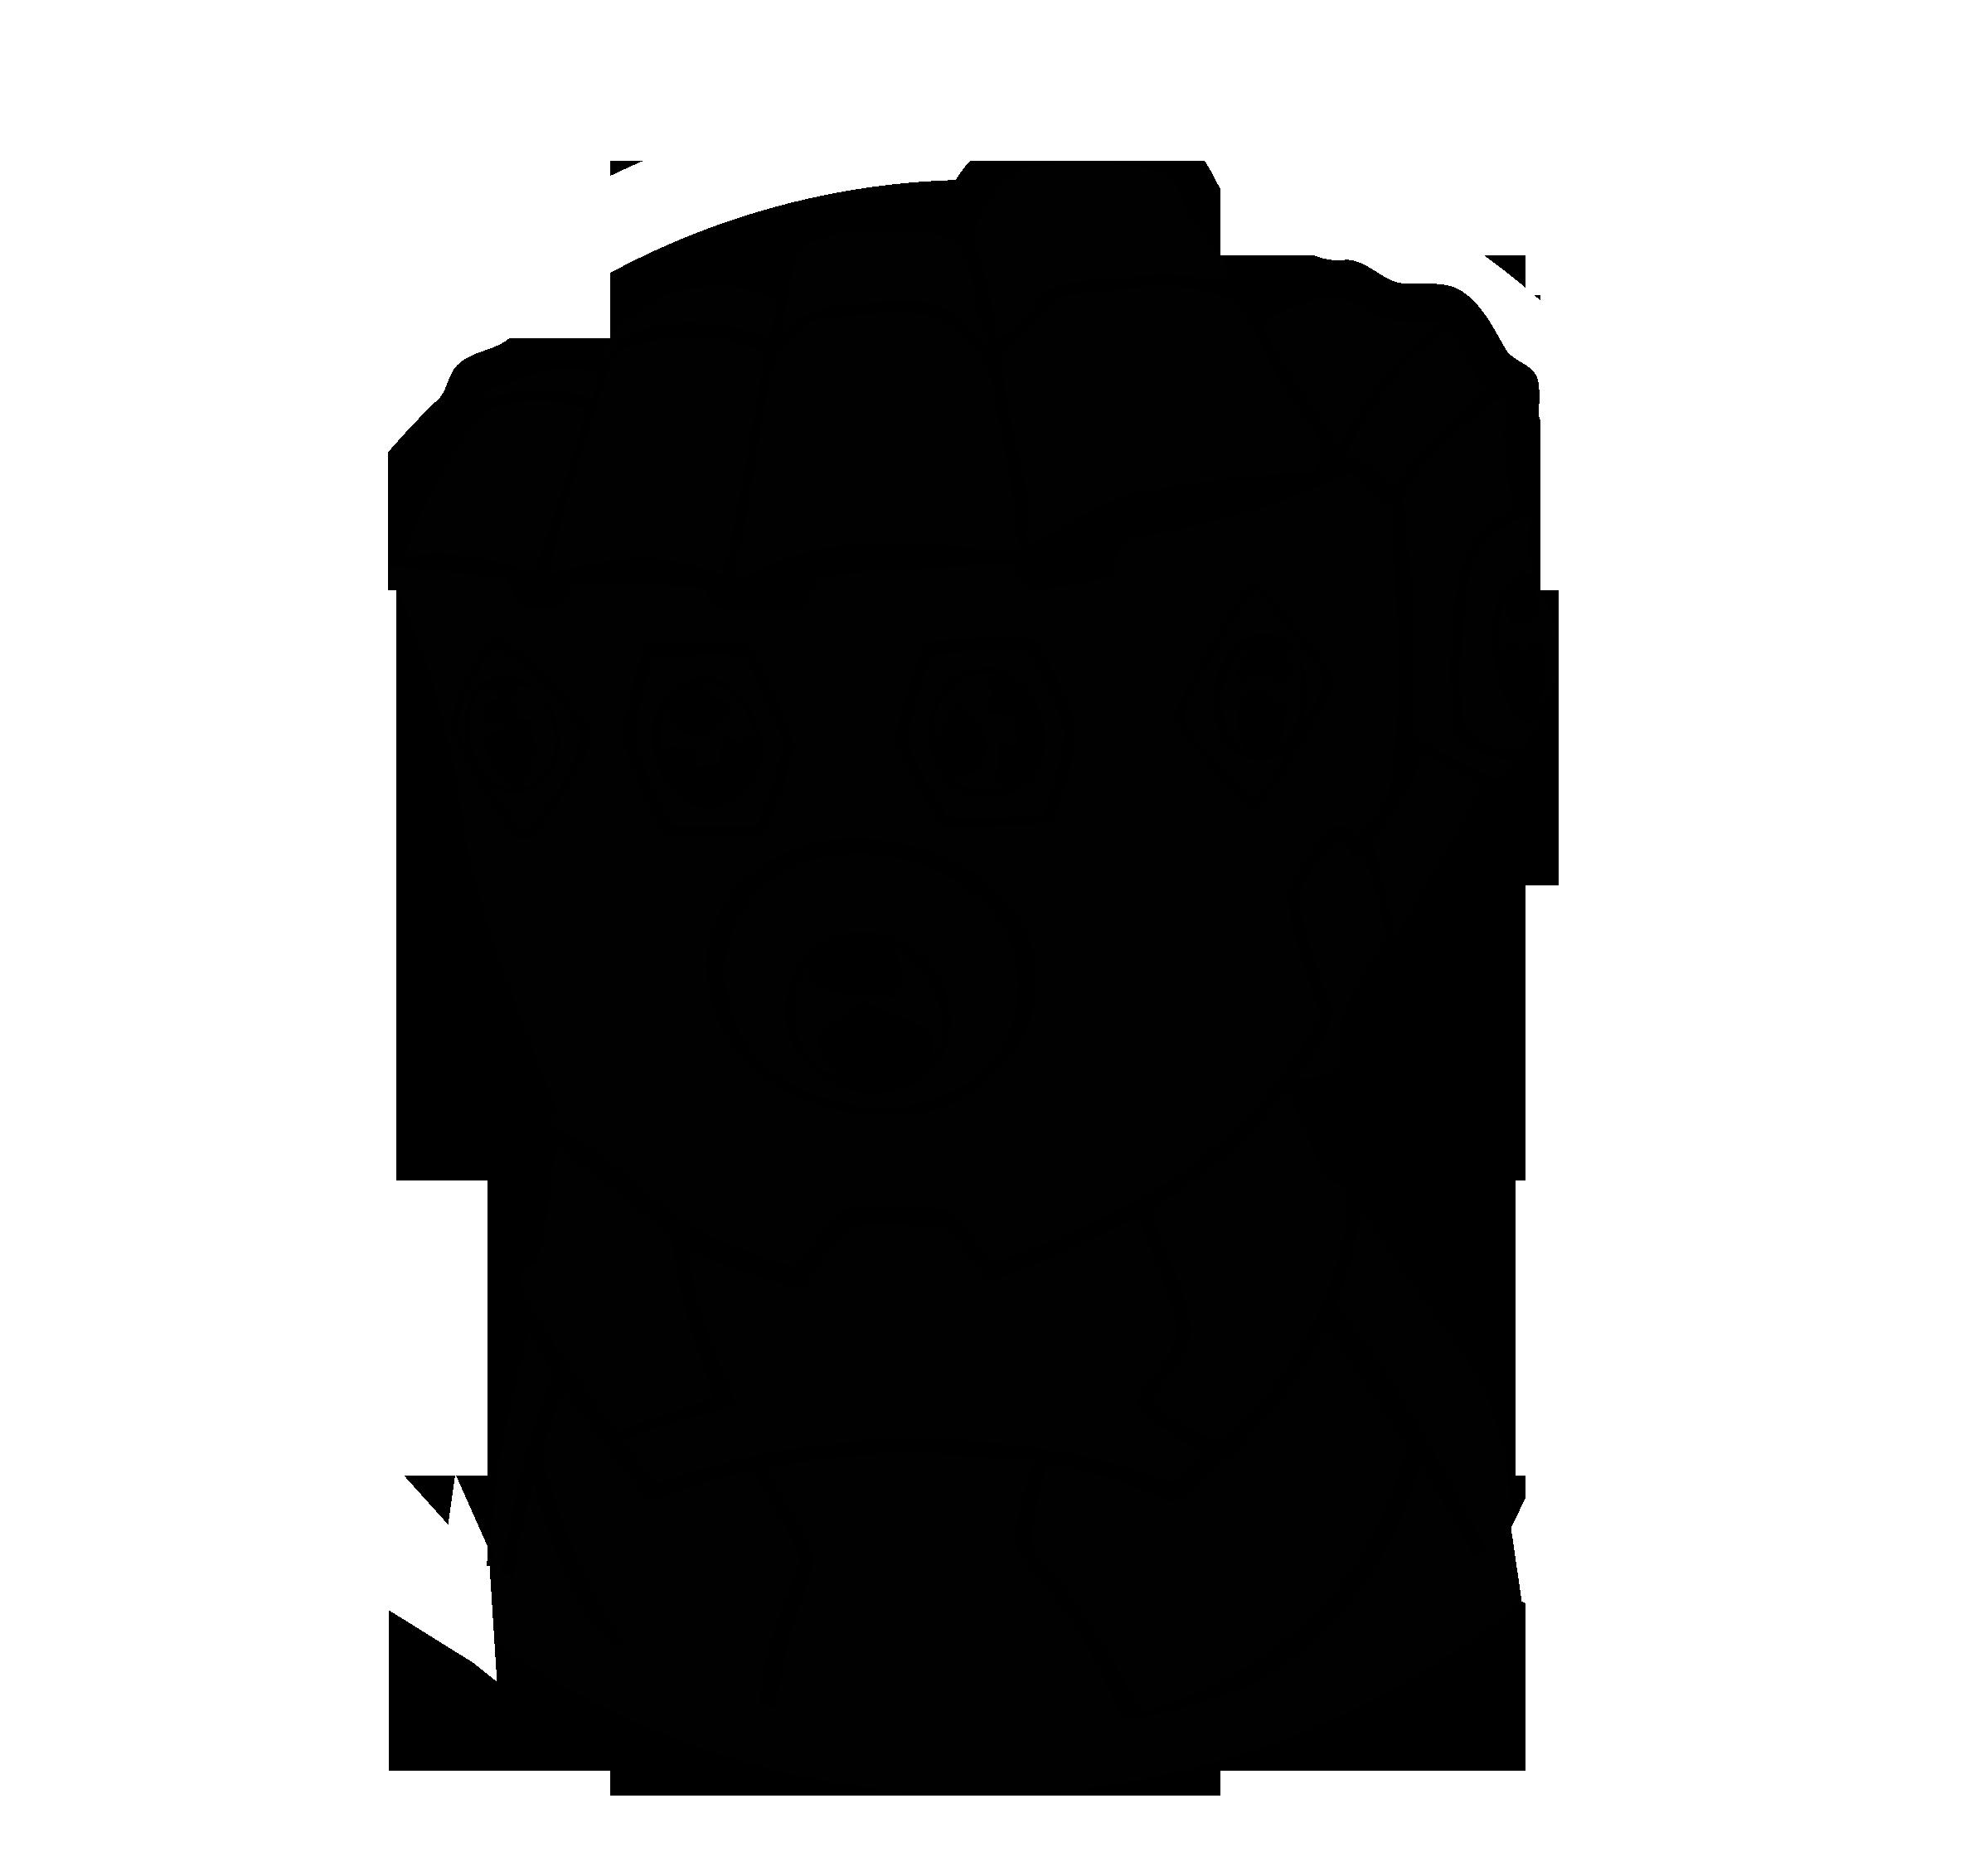 Avengers gauntlet logo clipart clip transparent Oh Snap! Infinity Gauntlet Pie Recipe – Popcorner Reviews clip transparent